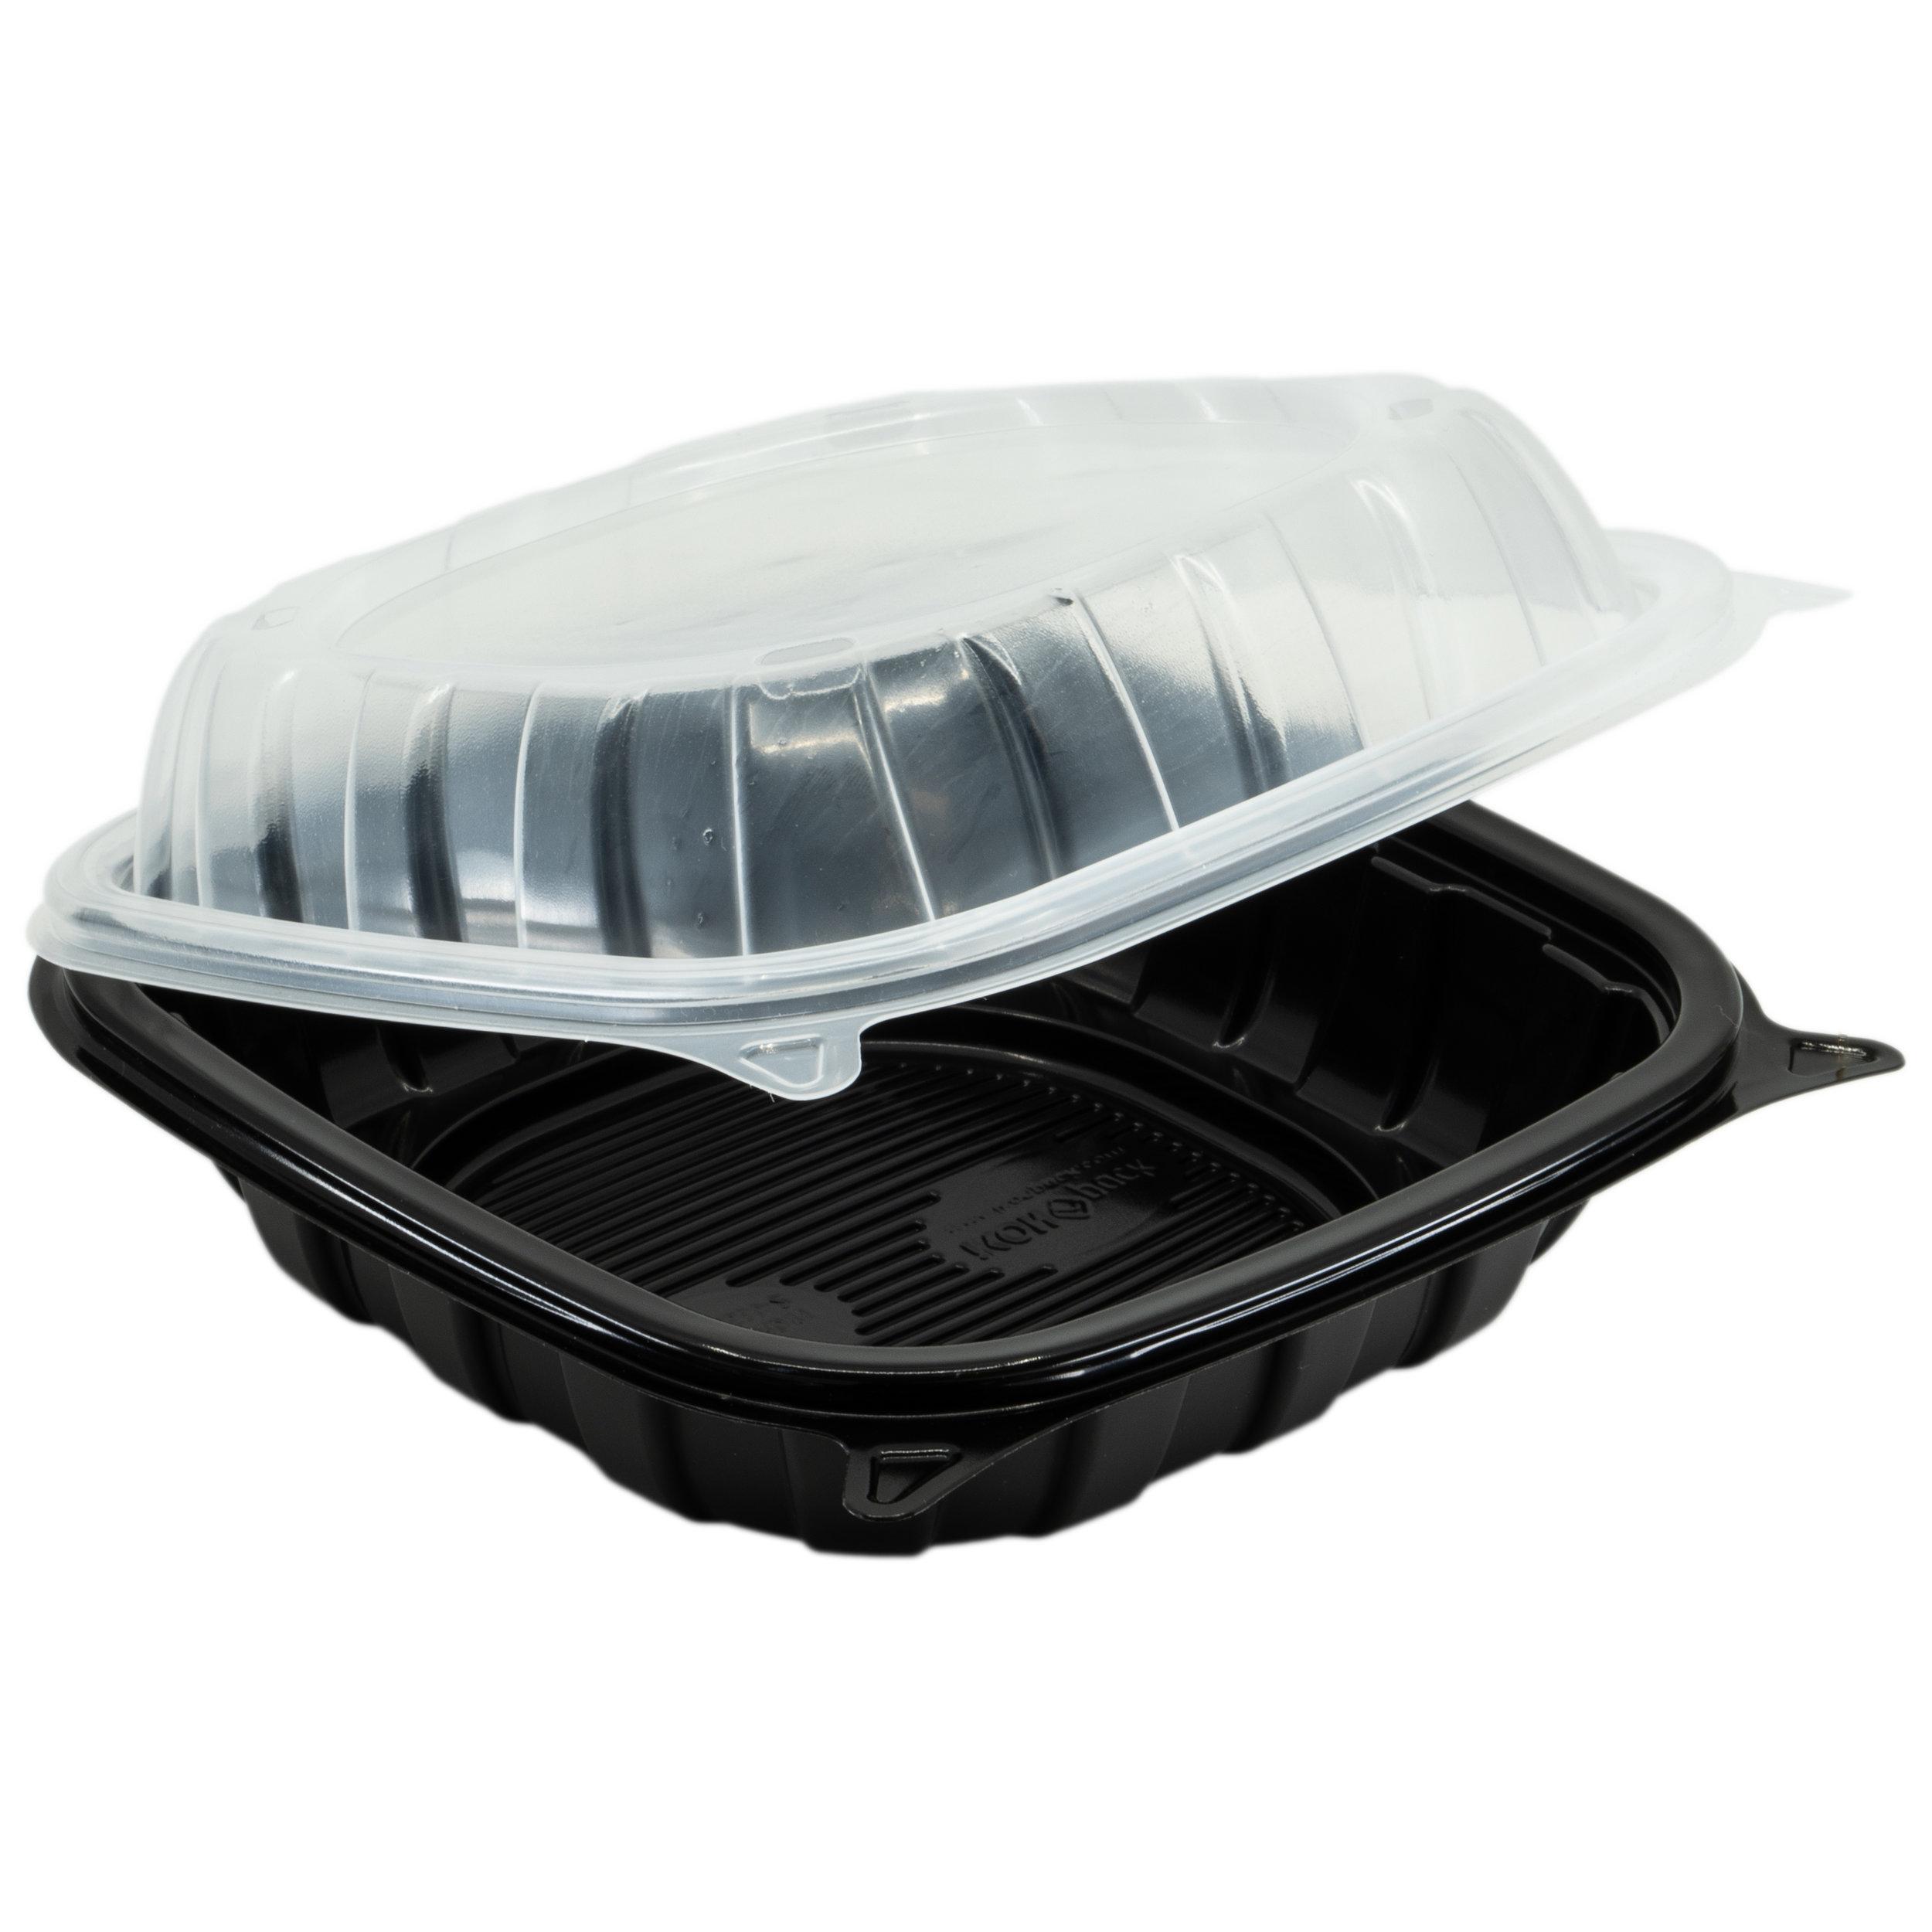 iK-MRDIN MEAL READY DINNER   204 x 204 x 80 mm 180 per carton